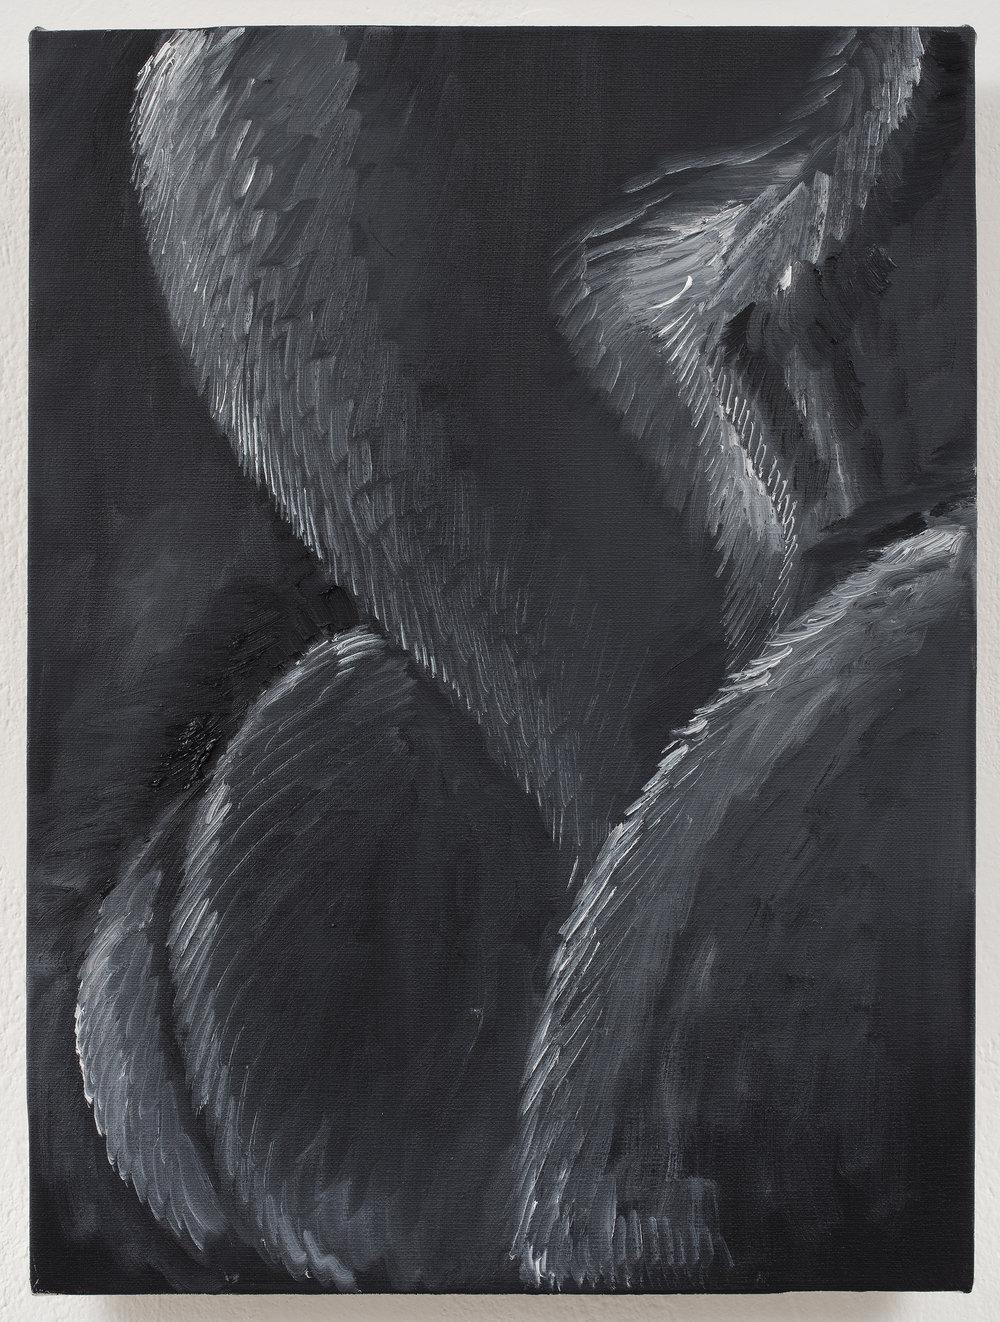 Pelicanny Pelican